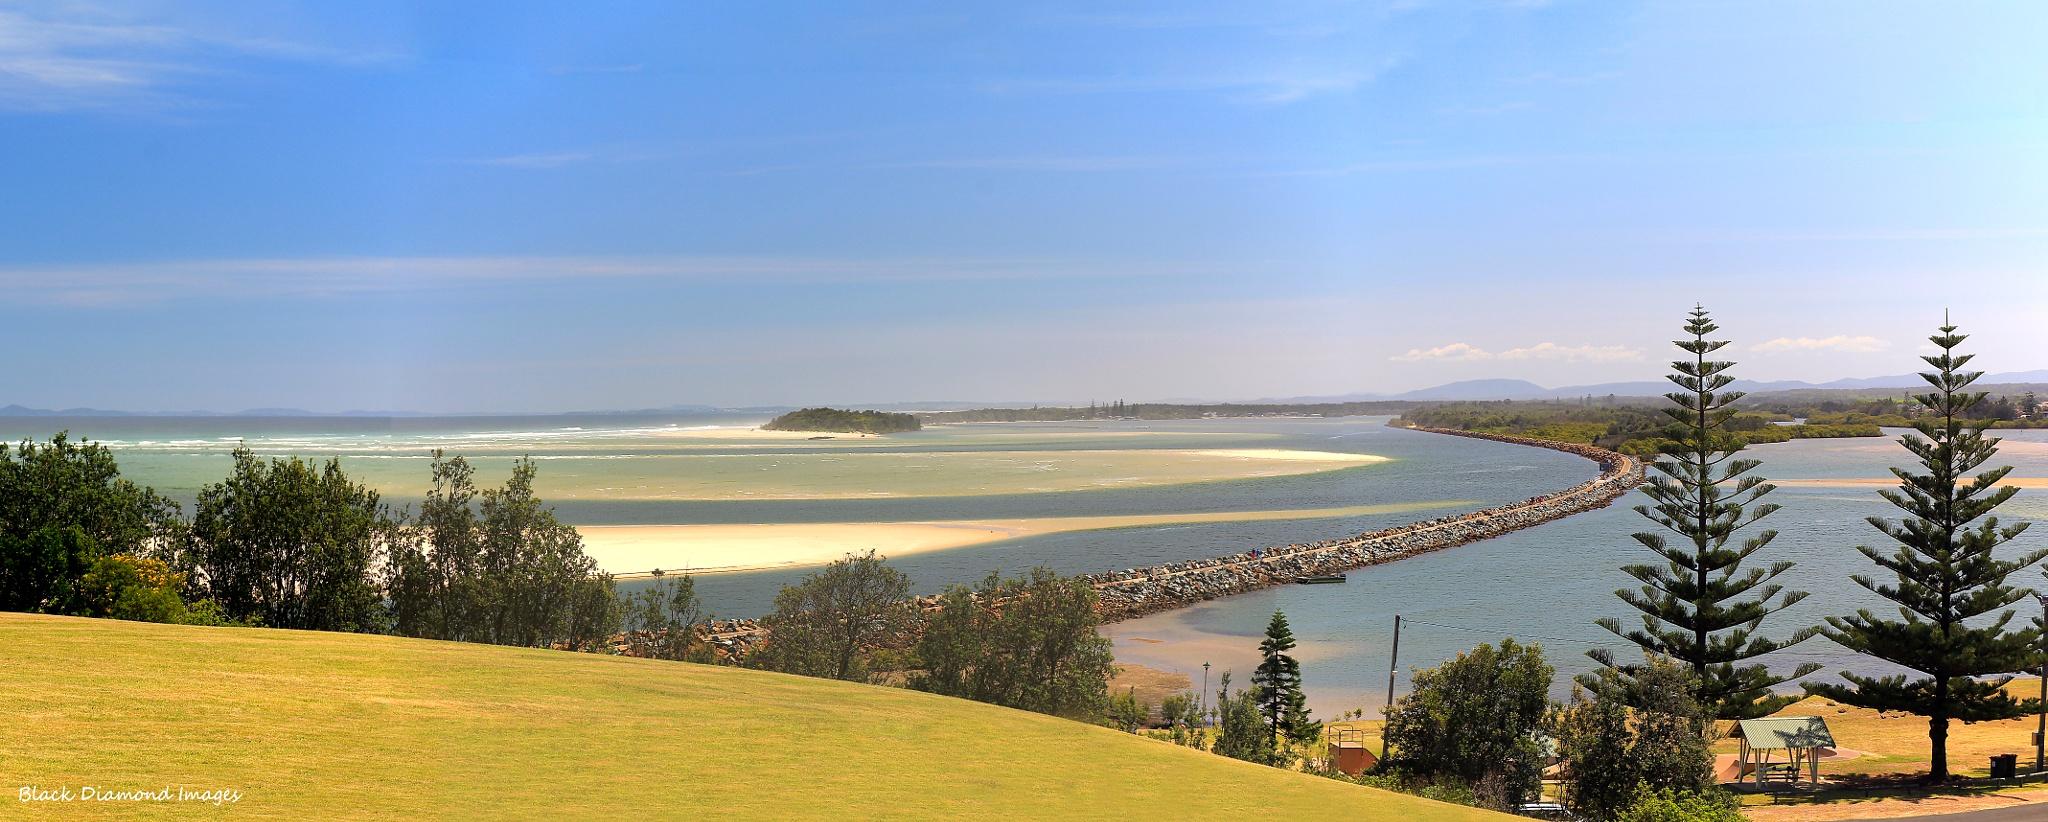 Manning River Estuary & Breakwall at Harrington, Mid North Coast, NSW by blackdiamondimages